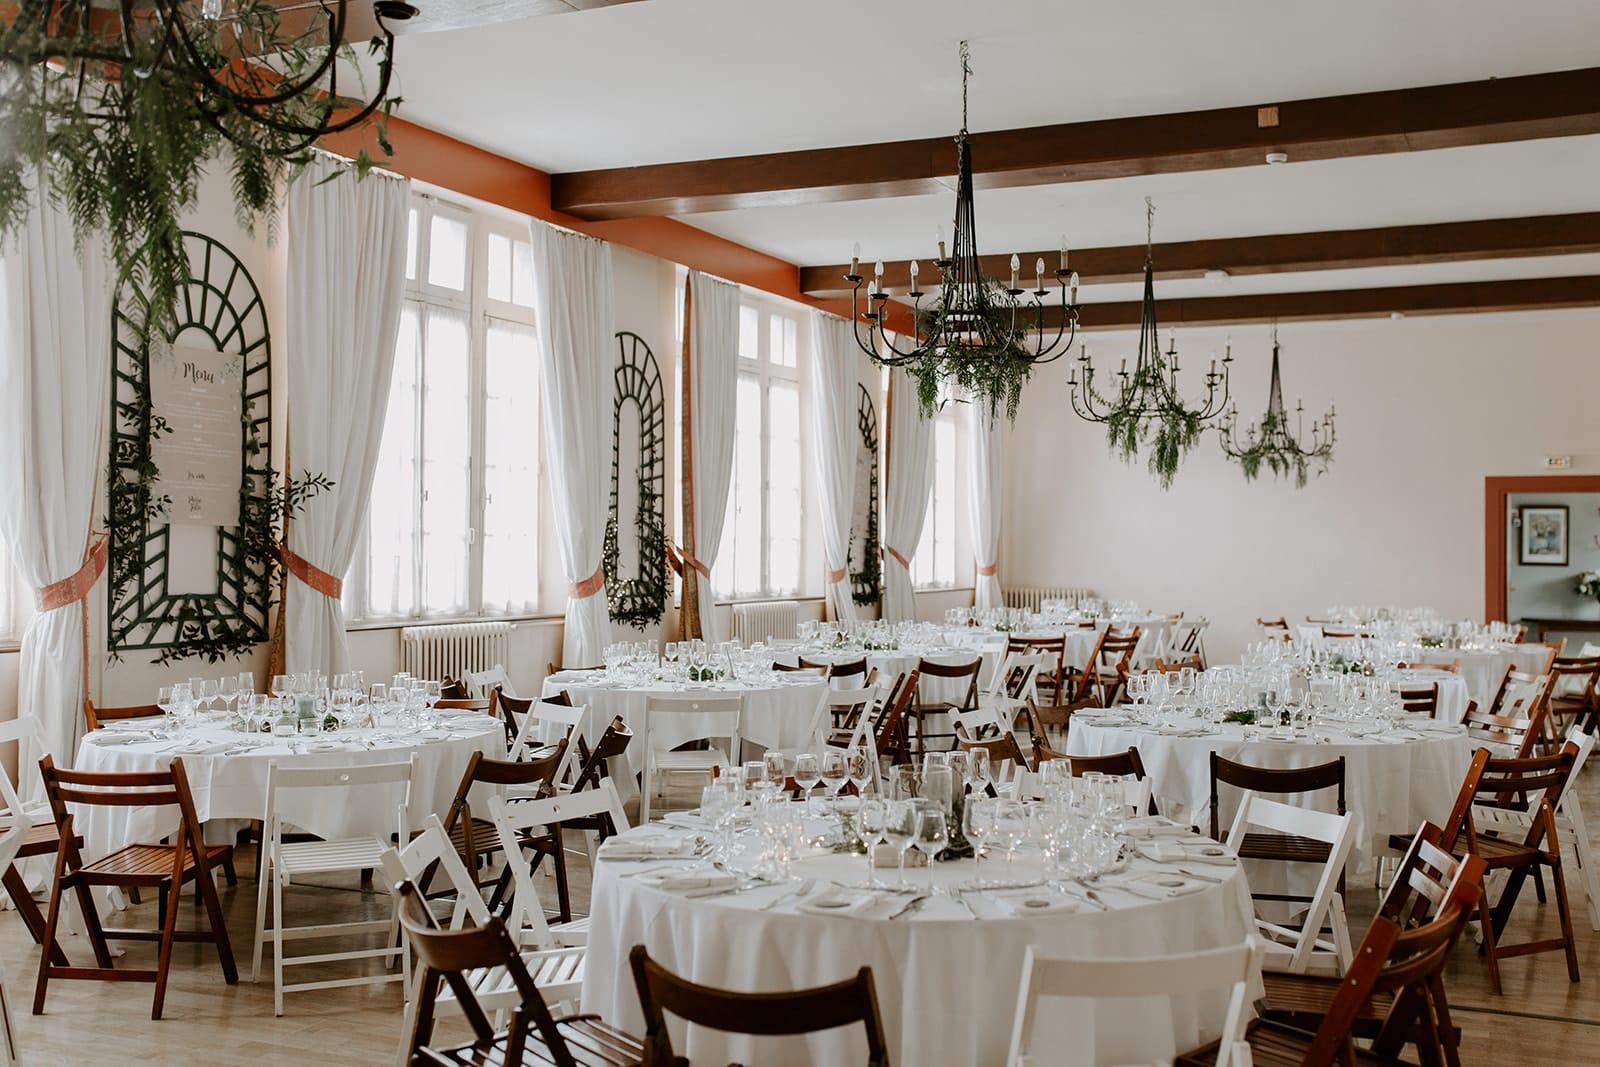 mariage_chateau_la_flocelliere_vendee_flavie_nelly_photographe-4-obonheurdesdames-decoration-mariage-location-vegetal